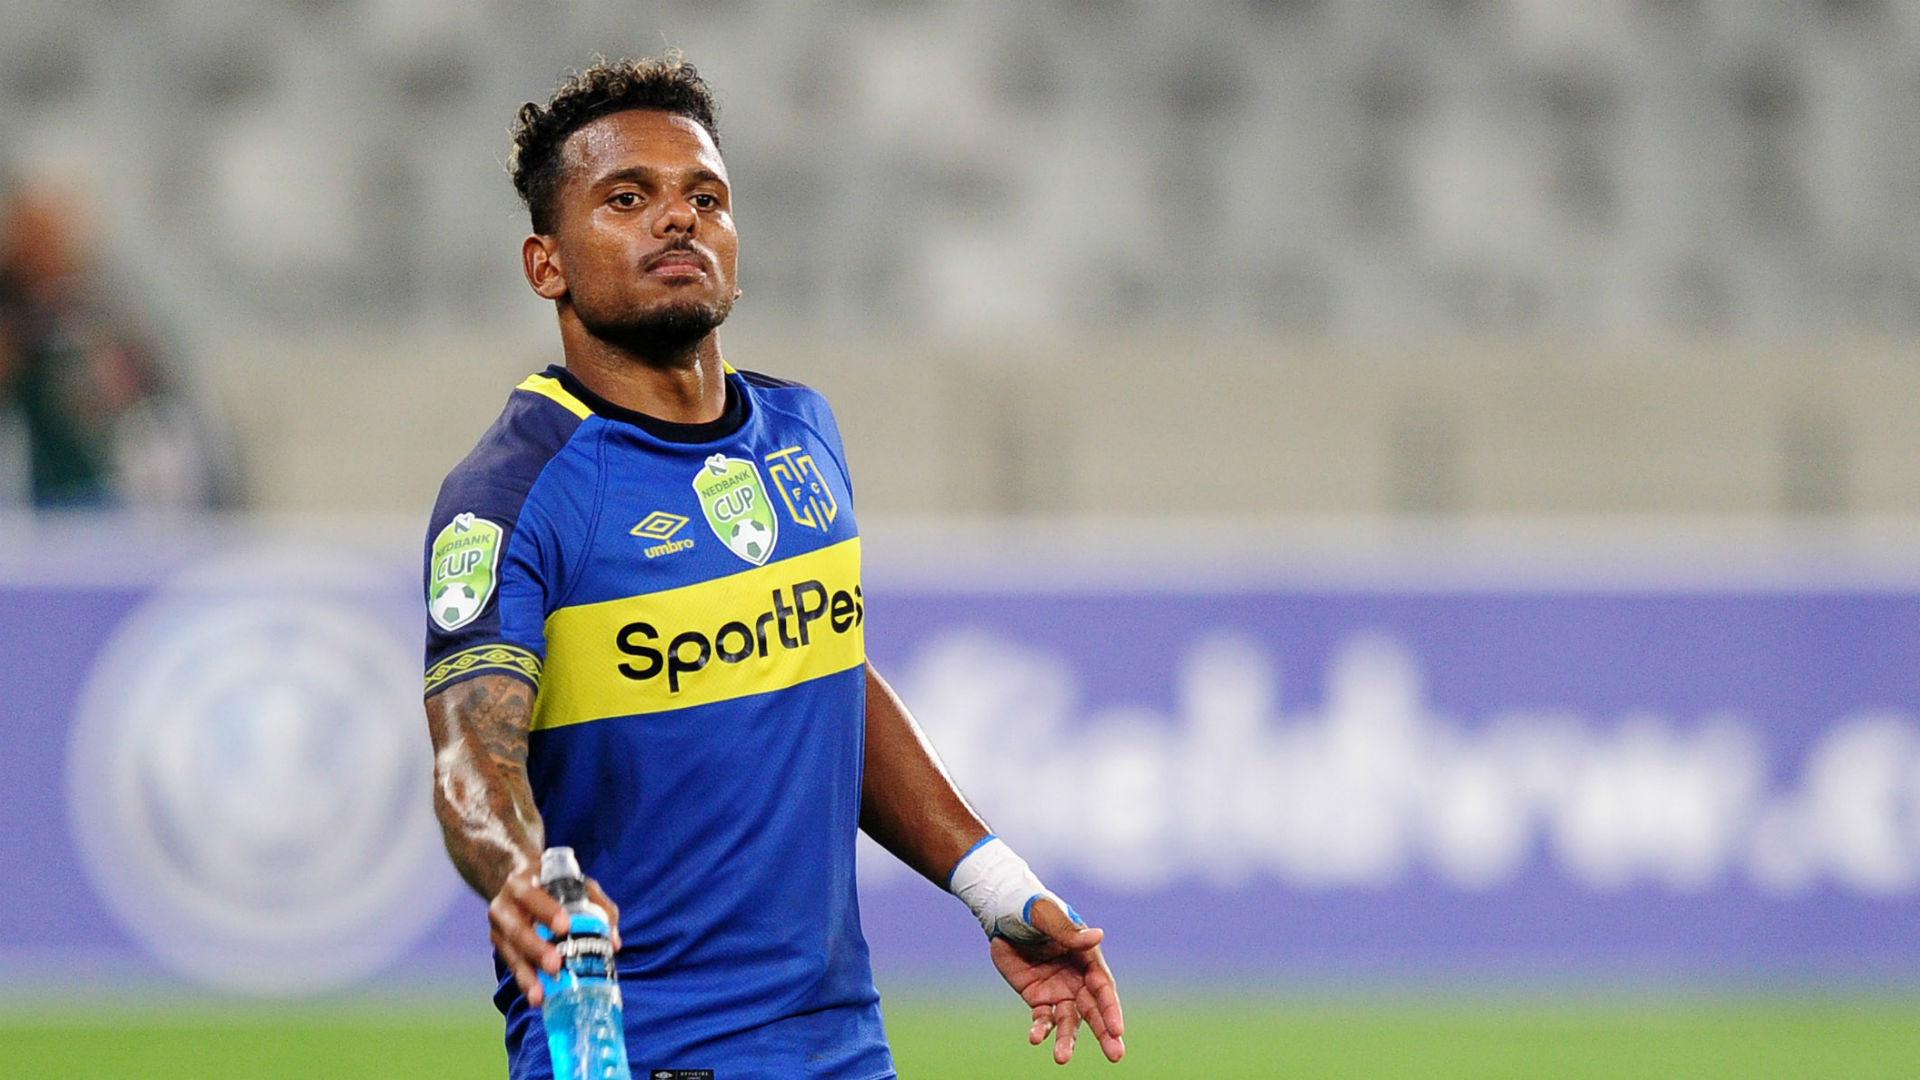 Cape Town City striker Kermit Erasmus surprised by Bafana Bafana call-up